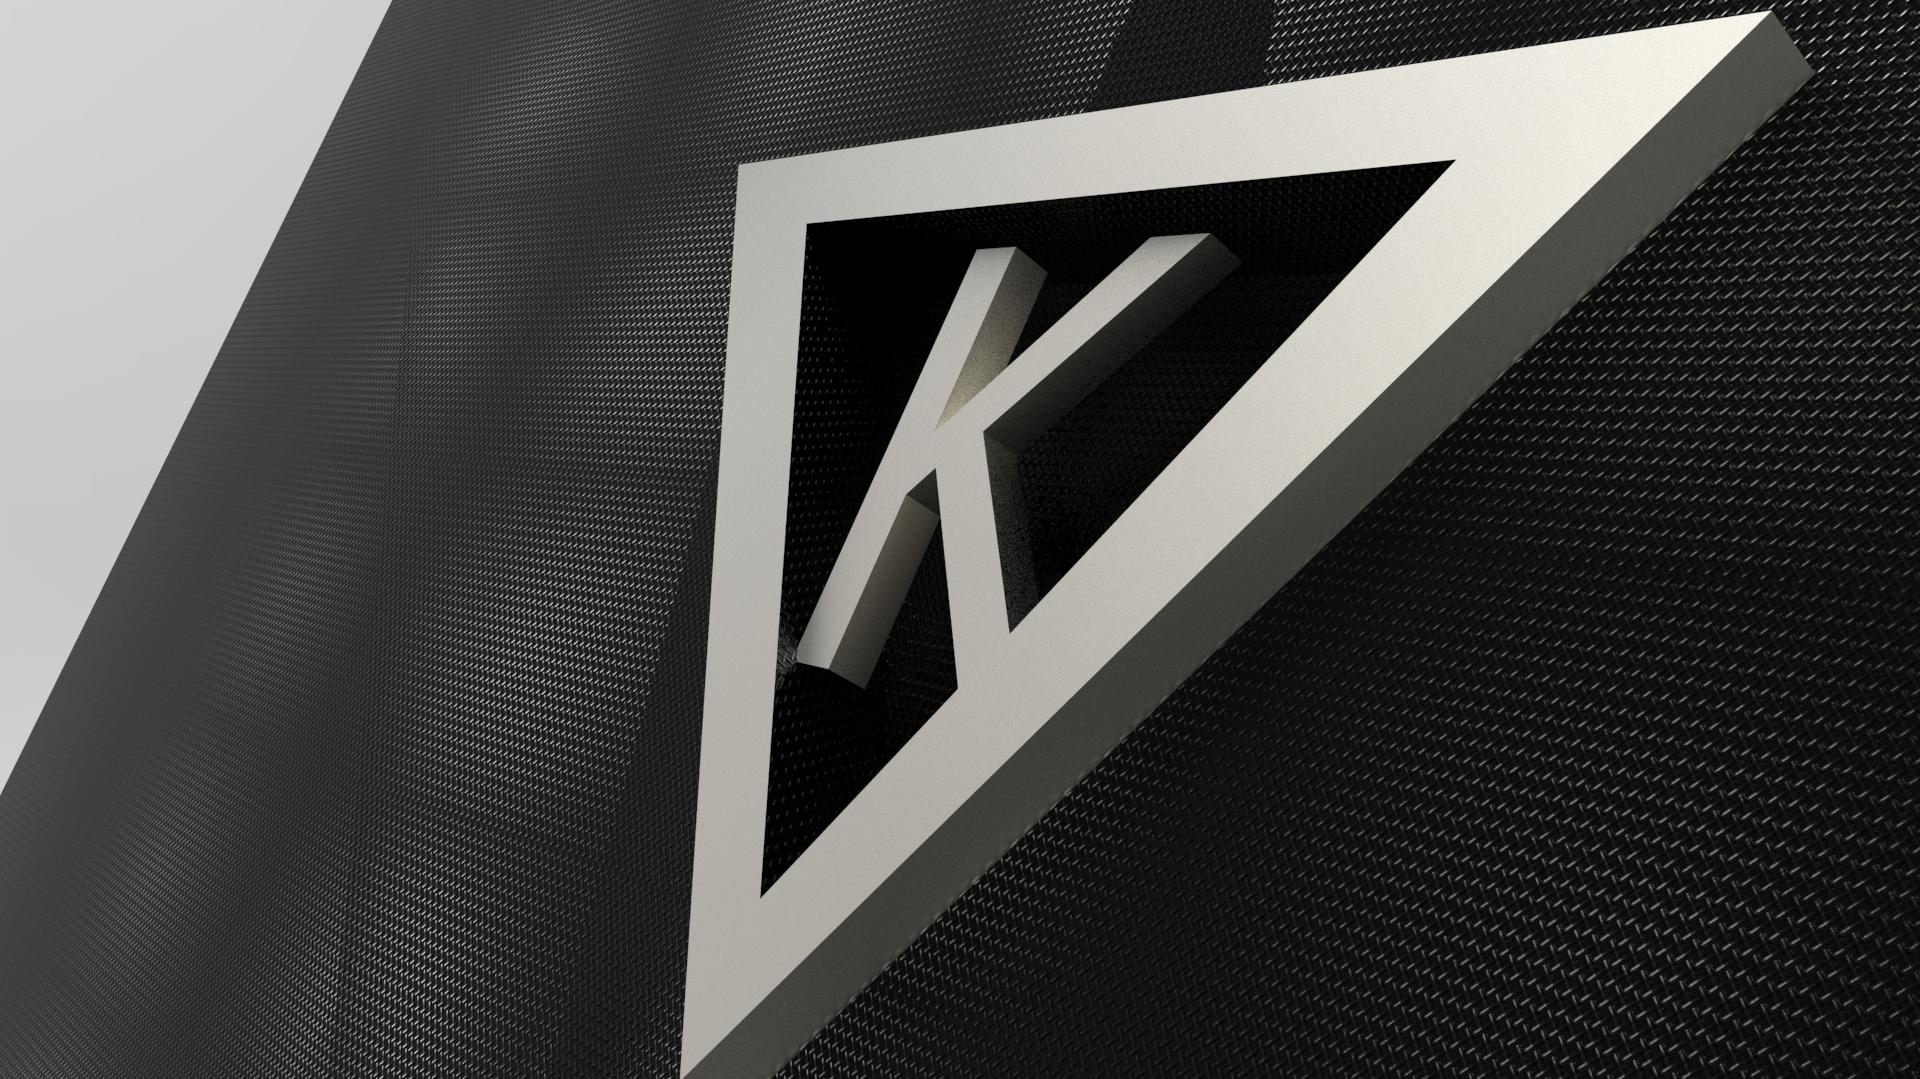 3D HoverBike | 3D Models |Kapera Designs|